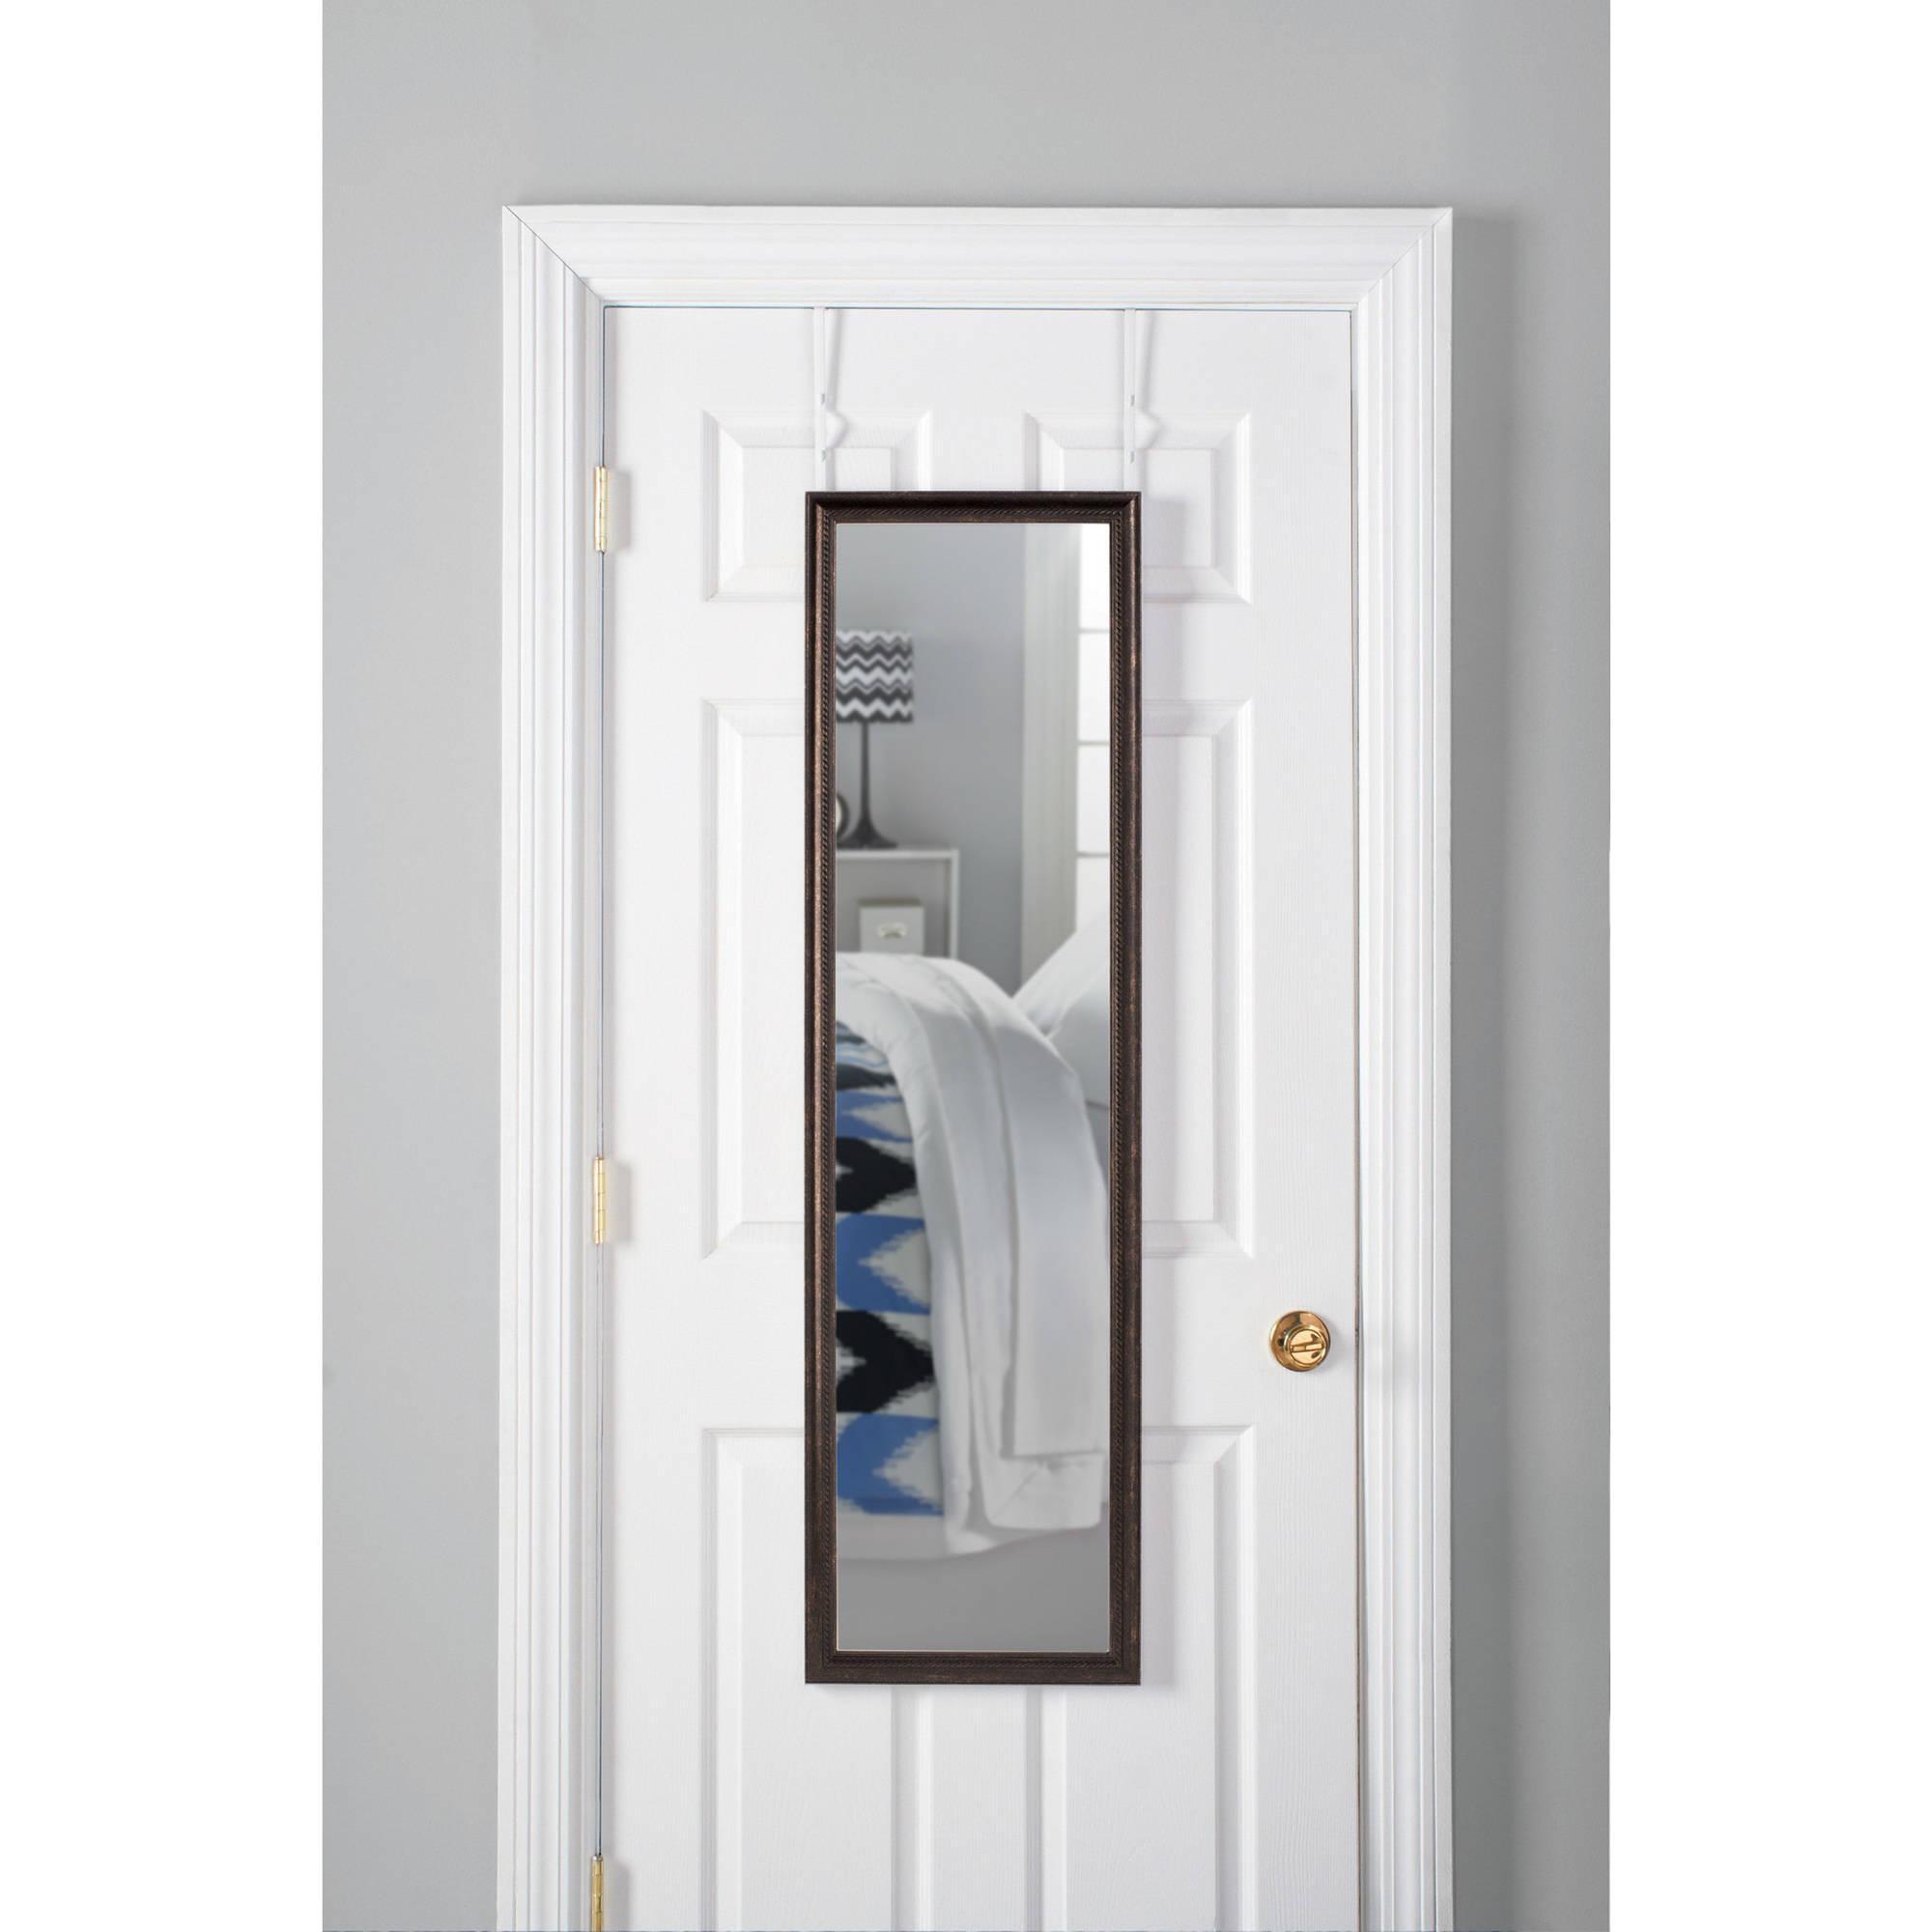 20 photos ornate white mirrors mirror ideas. Black Bedroom Furniture Sets. Home Design Ideas